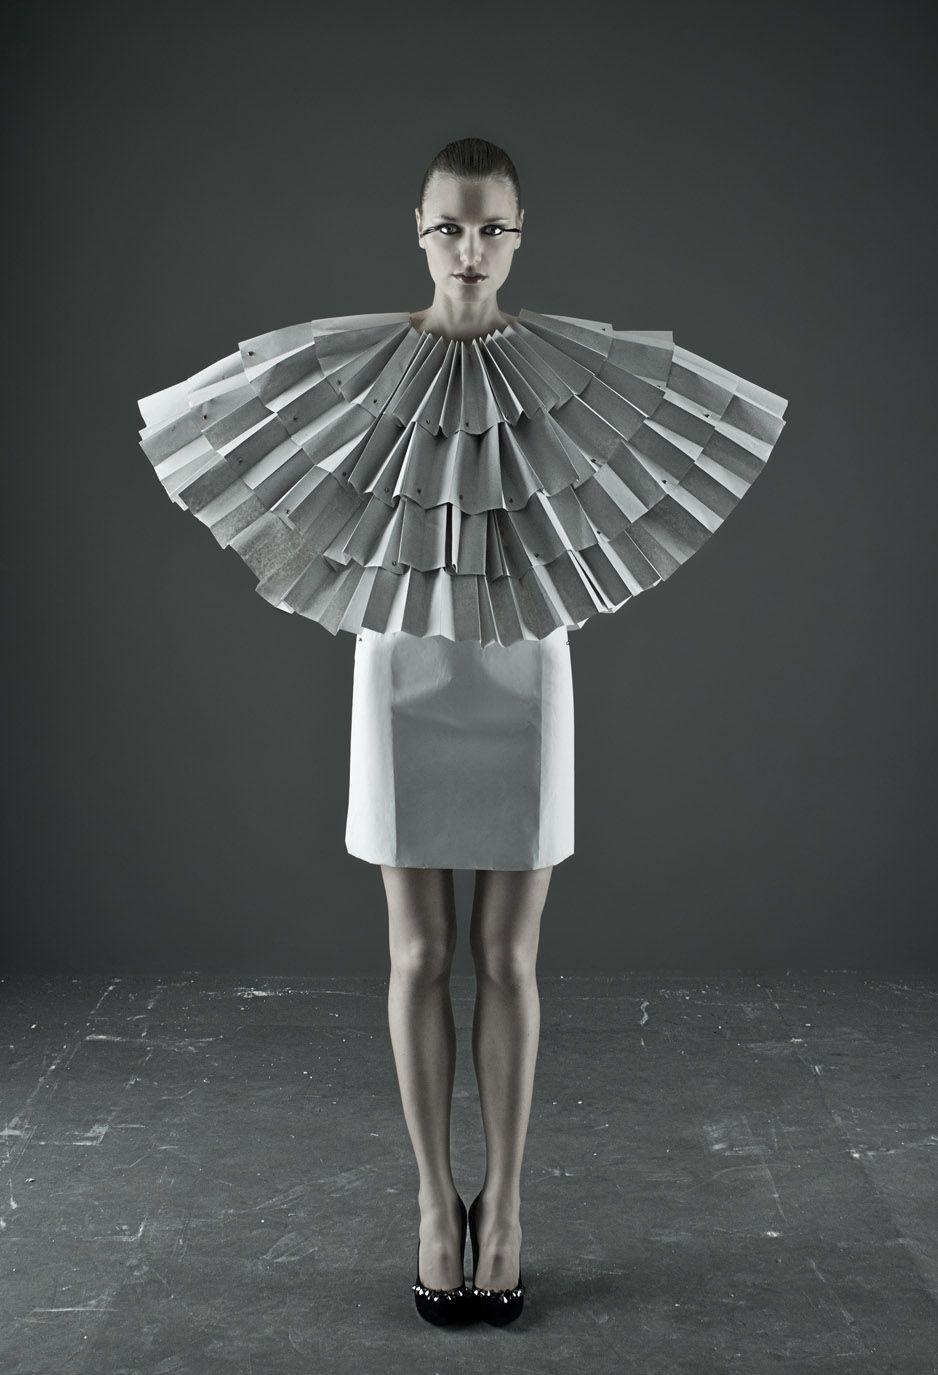 Fashion photography essay